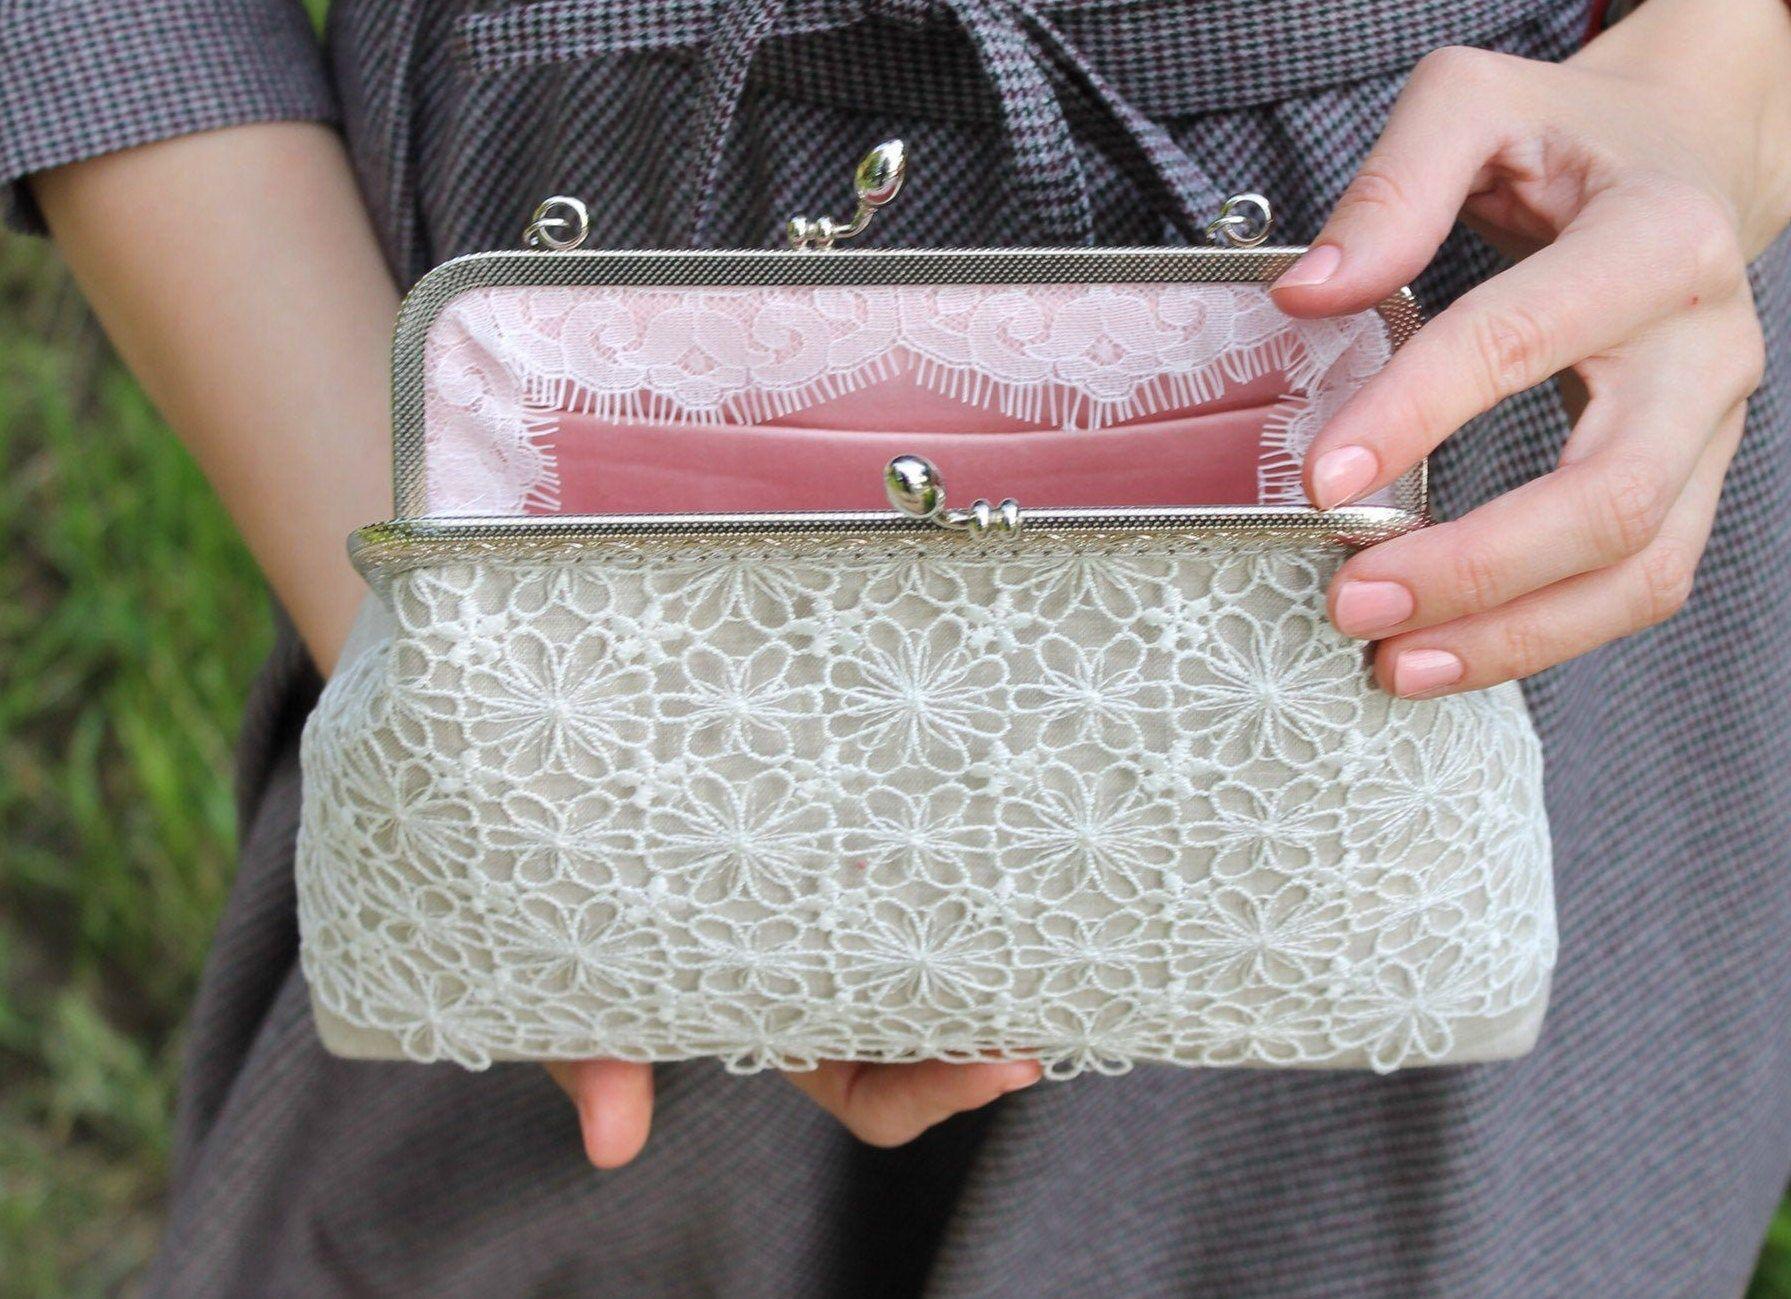 Bridal clutch linen handbag or crossbody purse with white